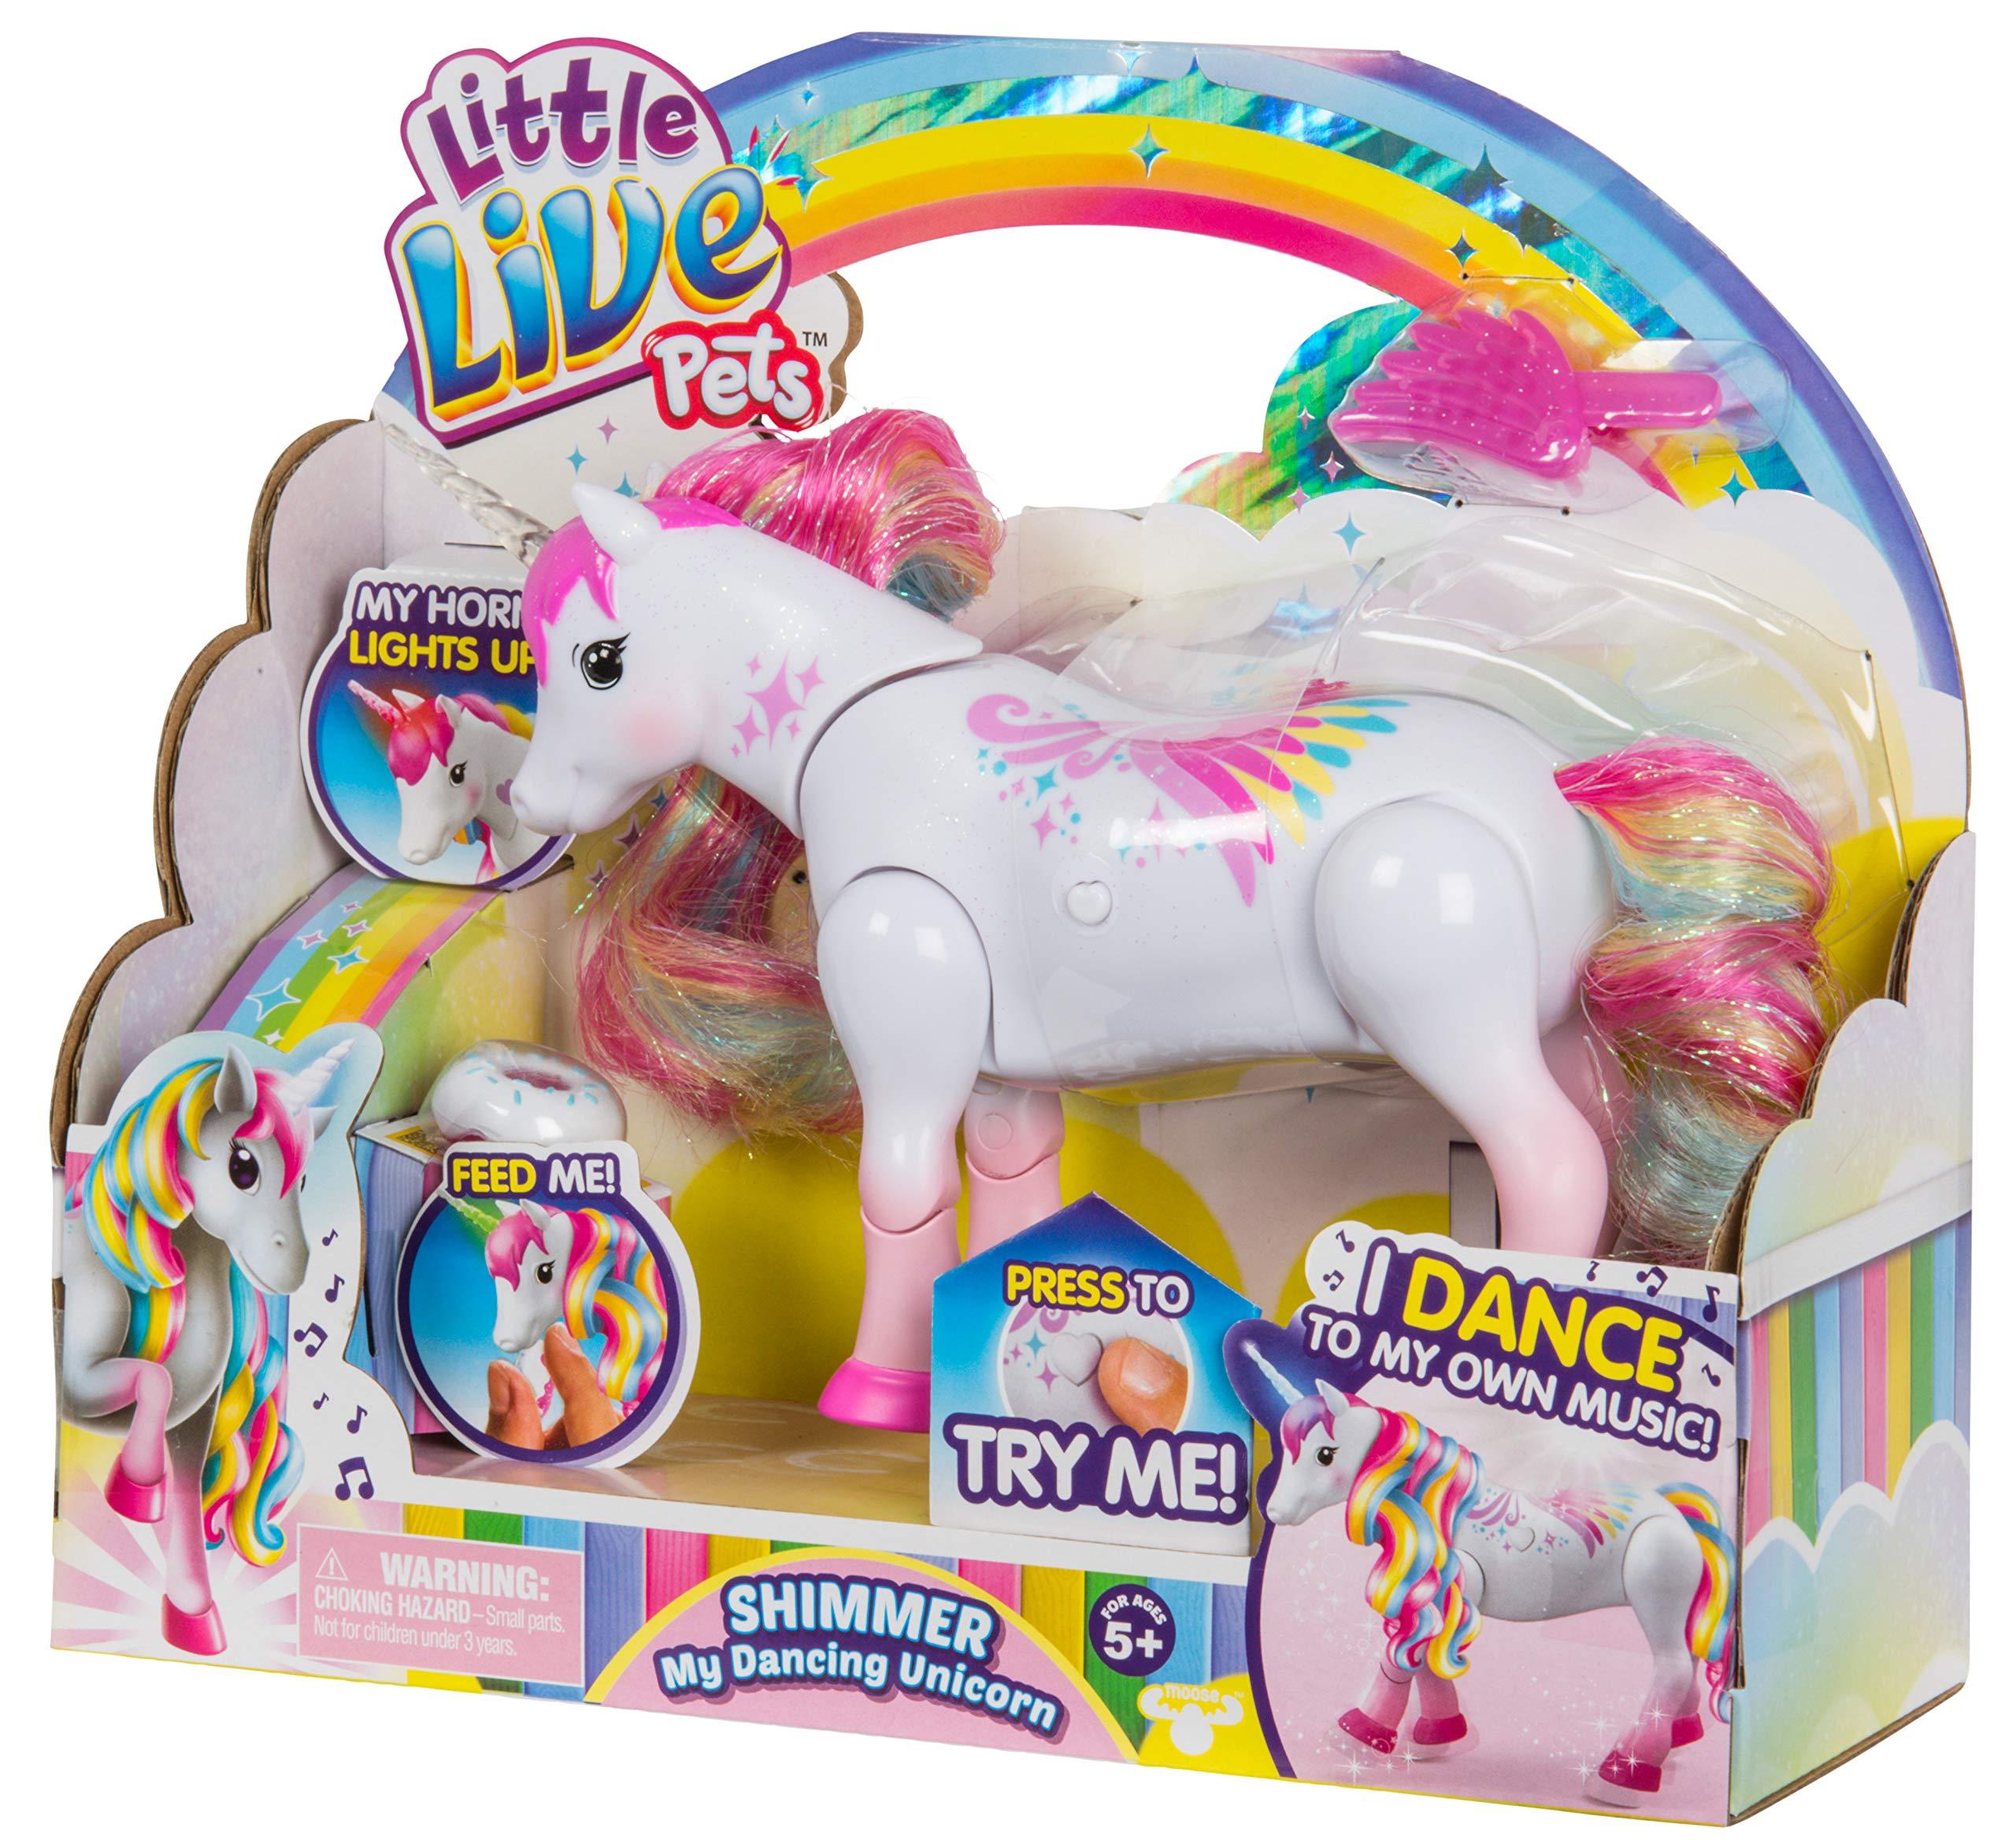 Little Live Pets Shimmer My Dancing Unicorn Rainbow Colors 3